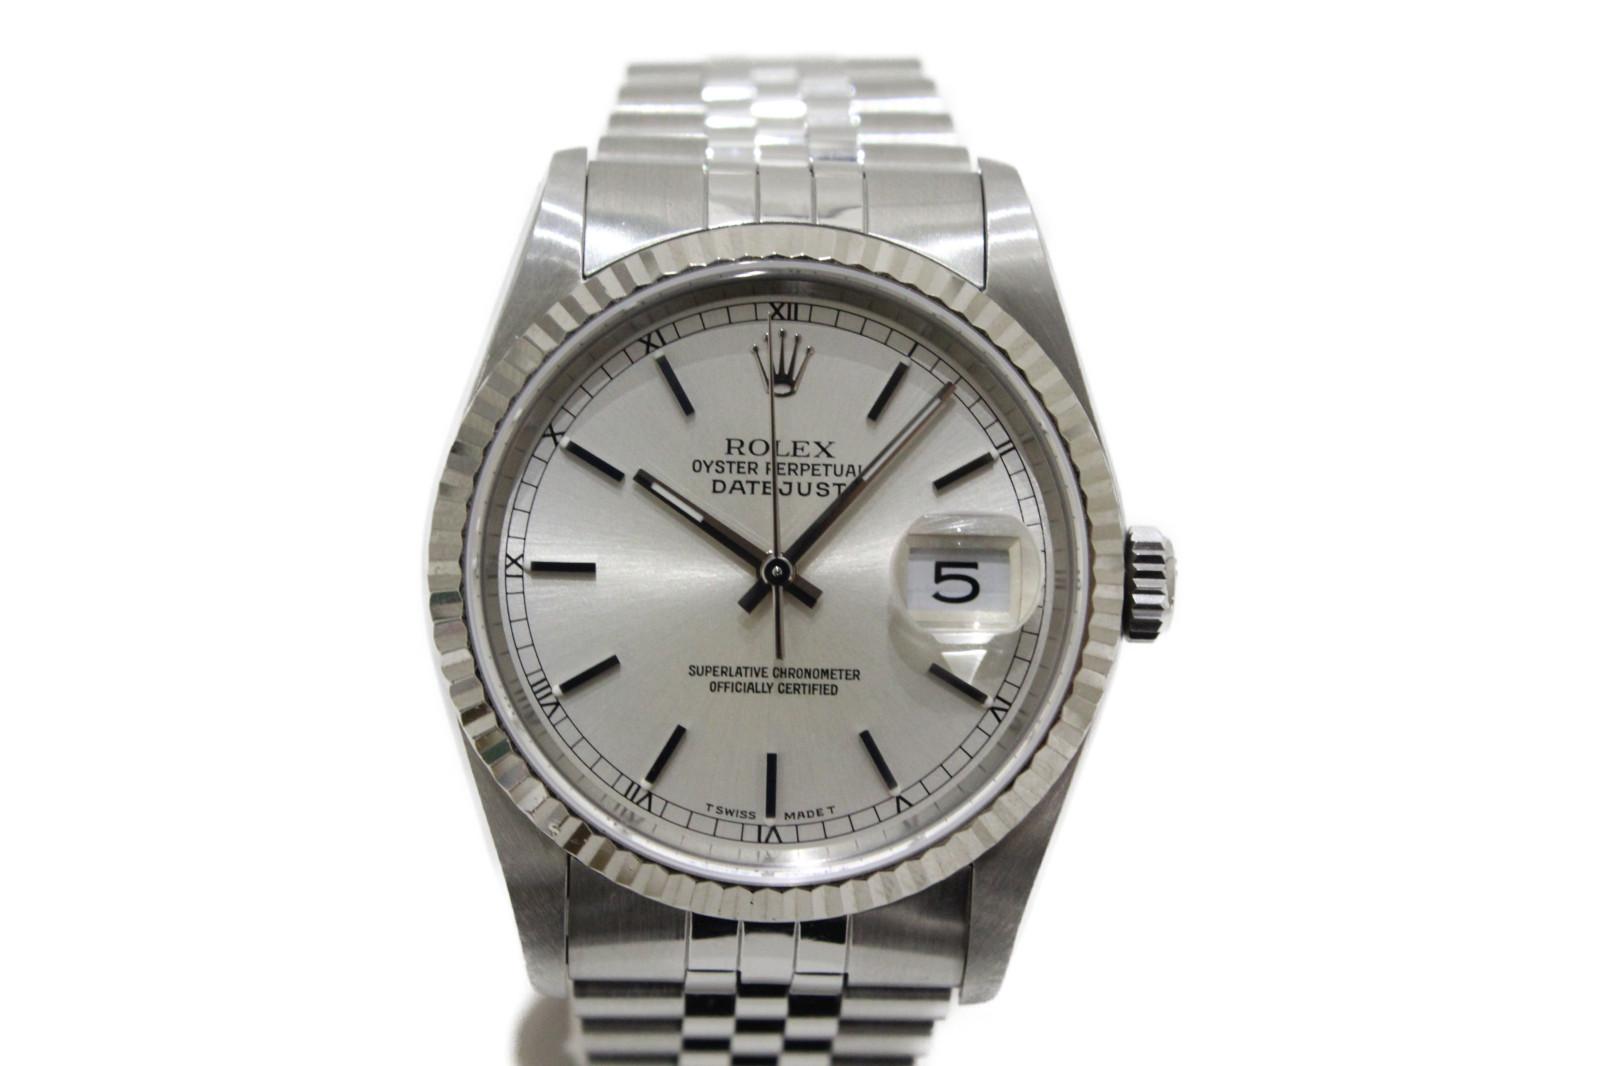 ROLEX ロレックス デイトジャスト 16234 L番 1989年 自動巻き K18WG ホワイトゴールド SS ステンレススチール シルバー メンズ 腕時計【中古】